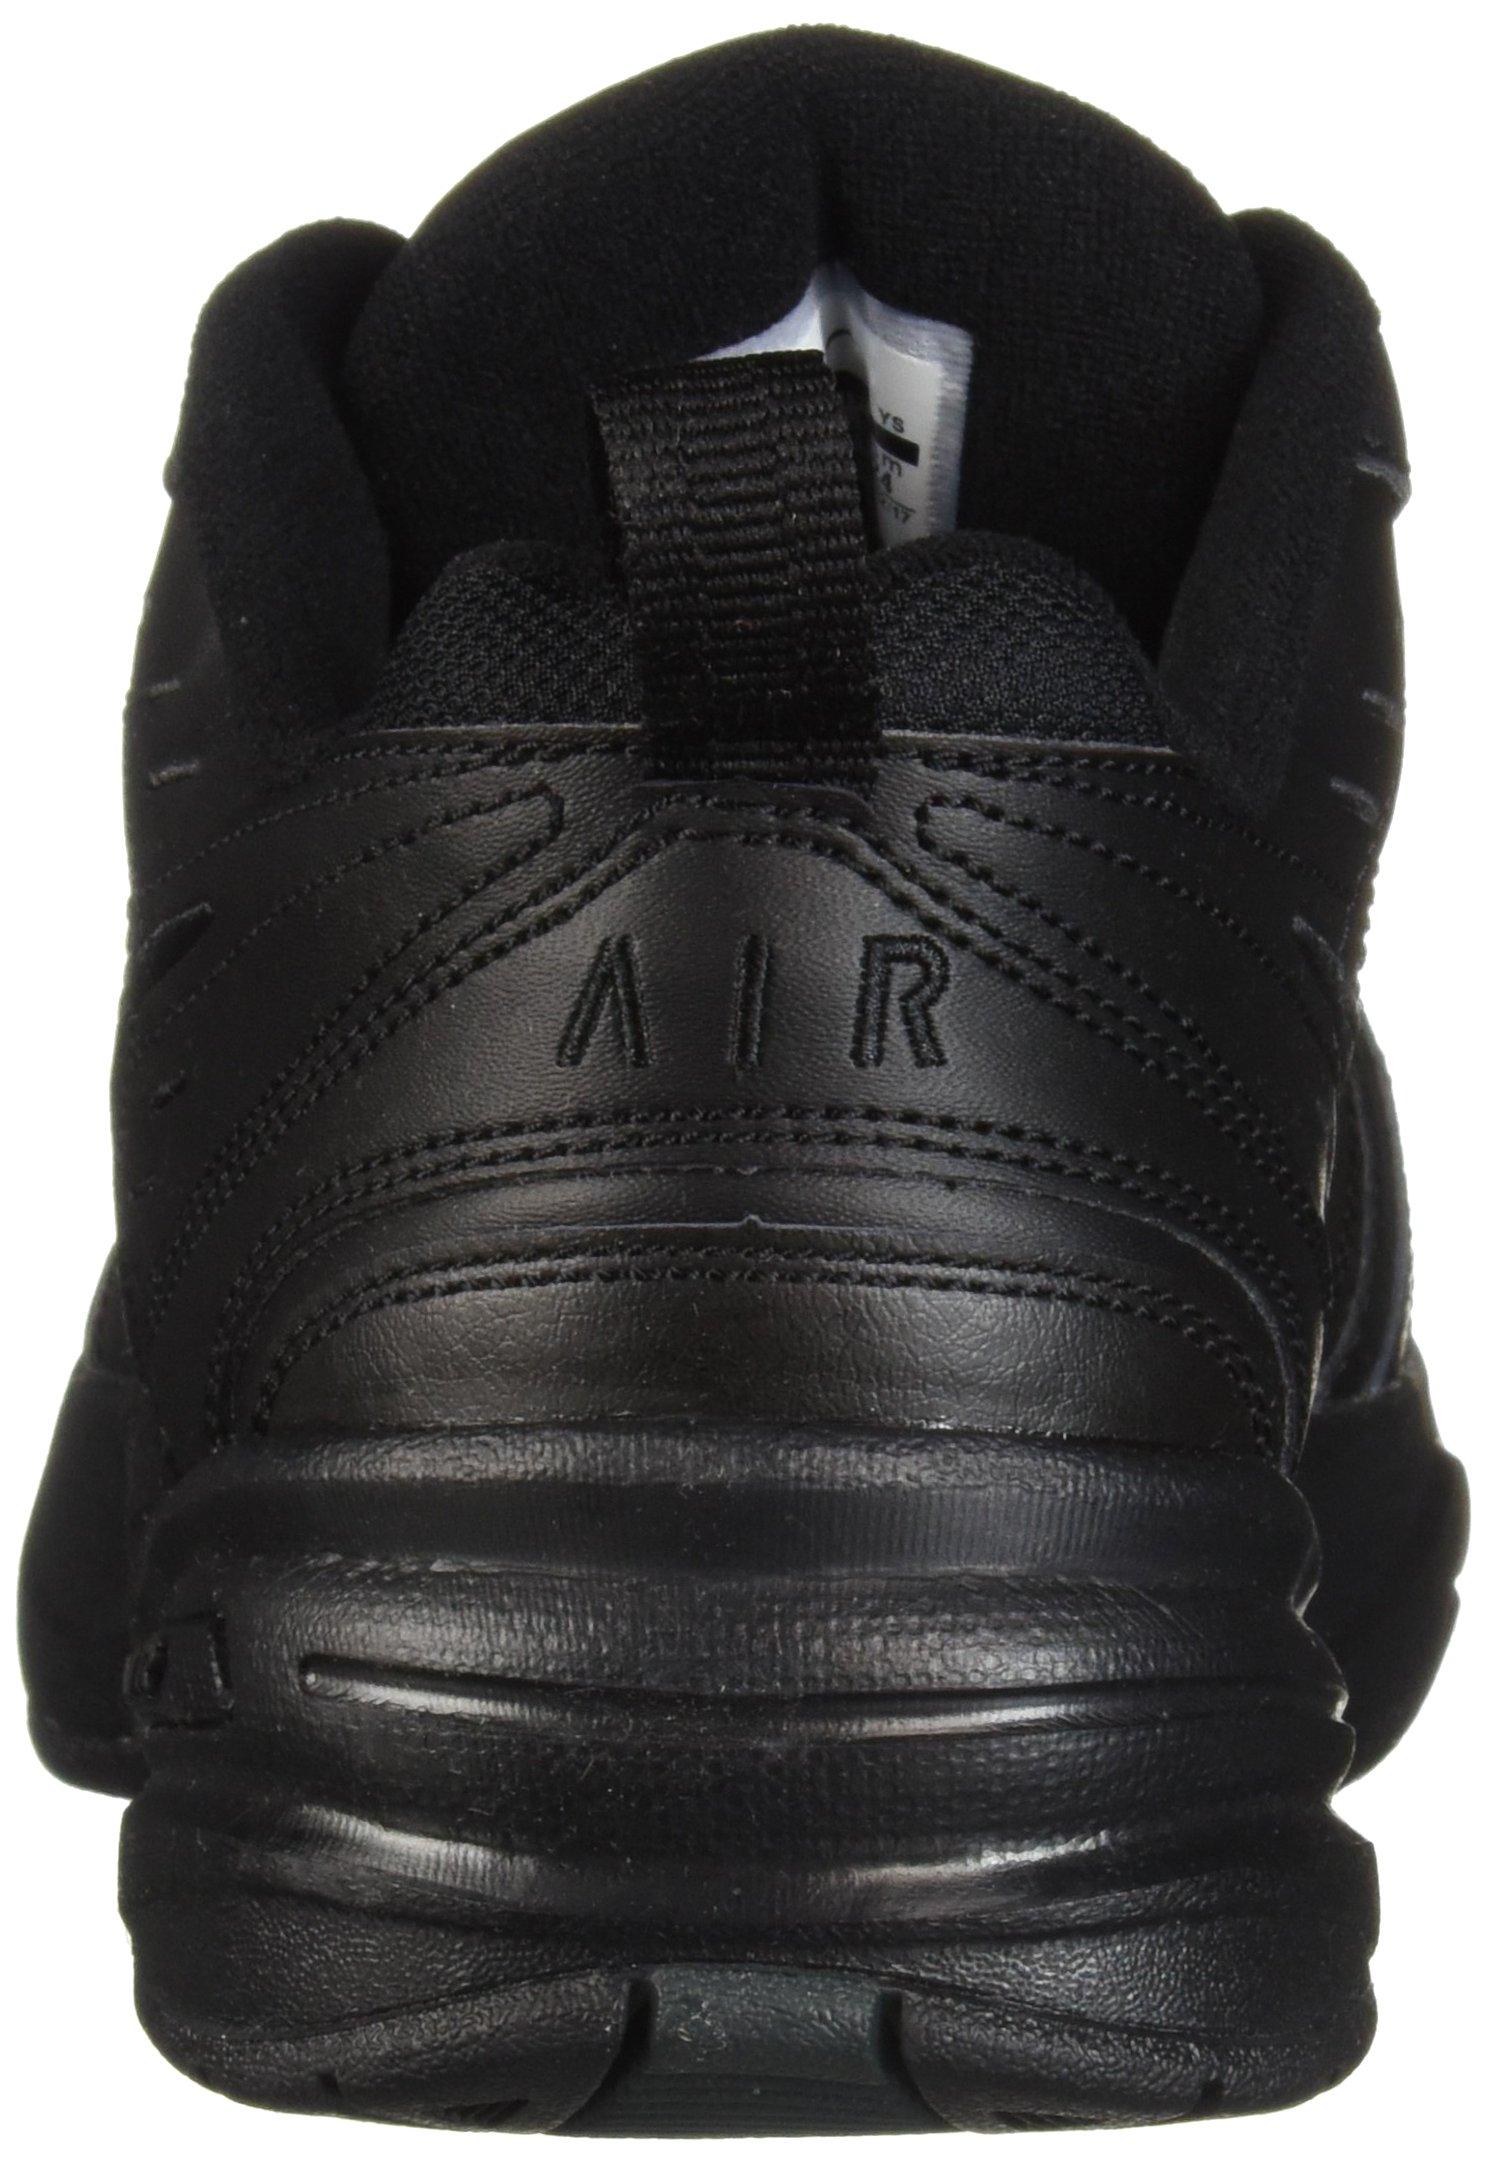 Nike-Men-039-s-Air-Monarch-IV-Cross-Trainer-Sneaker-416355 thumbnail 4